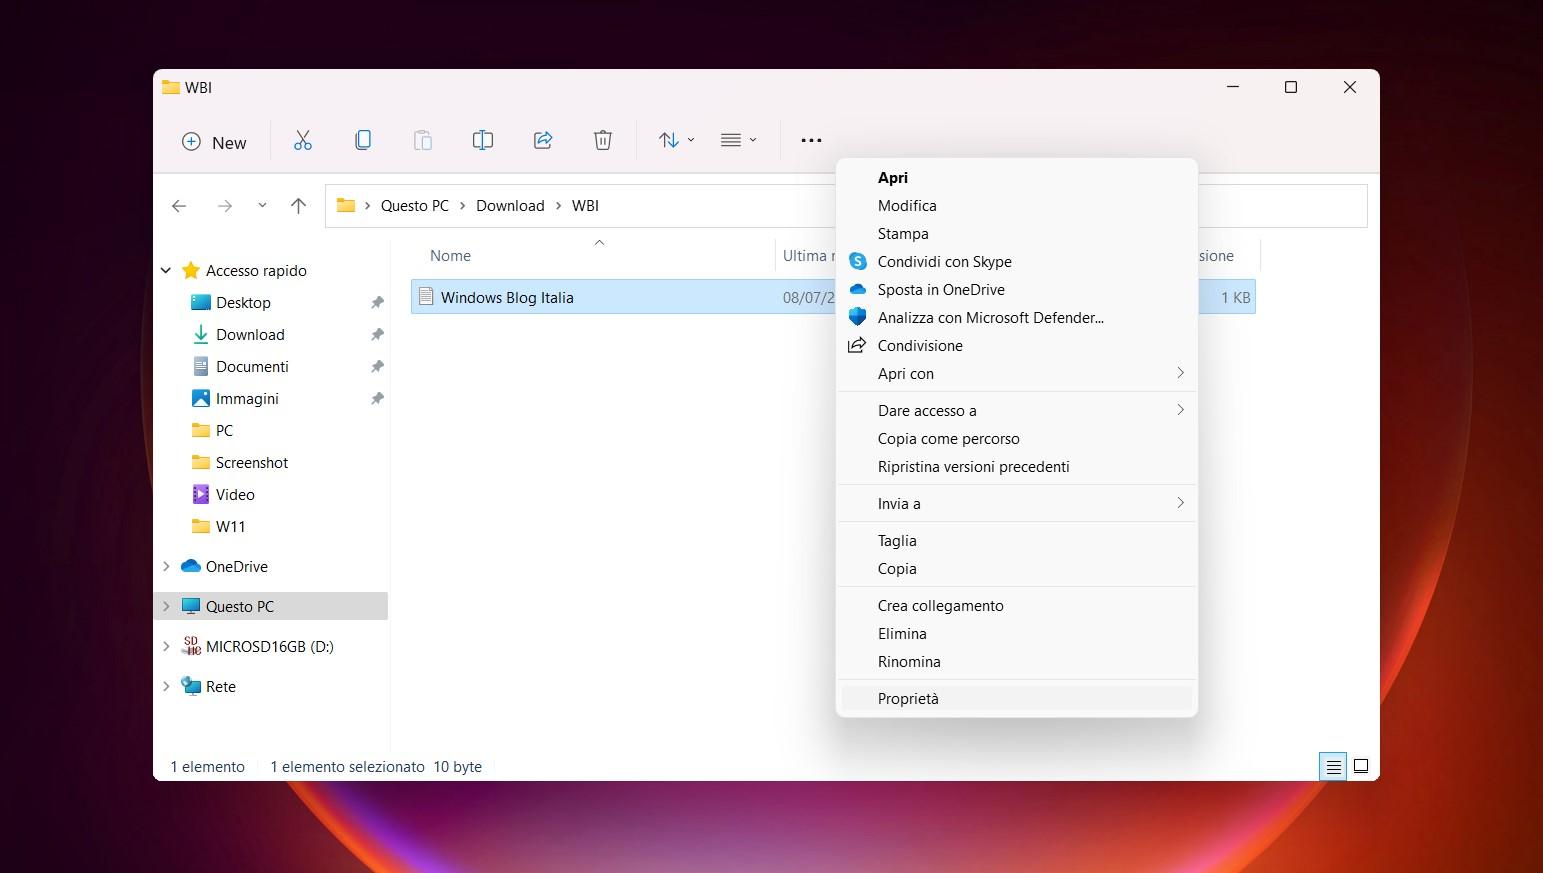 Windows 11 Build 22000.51 - Menu contestuale con vecchio layout